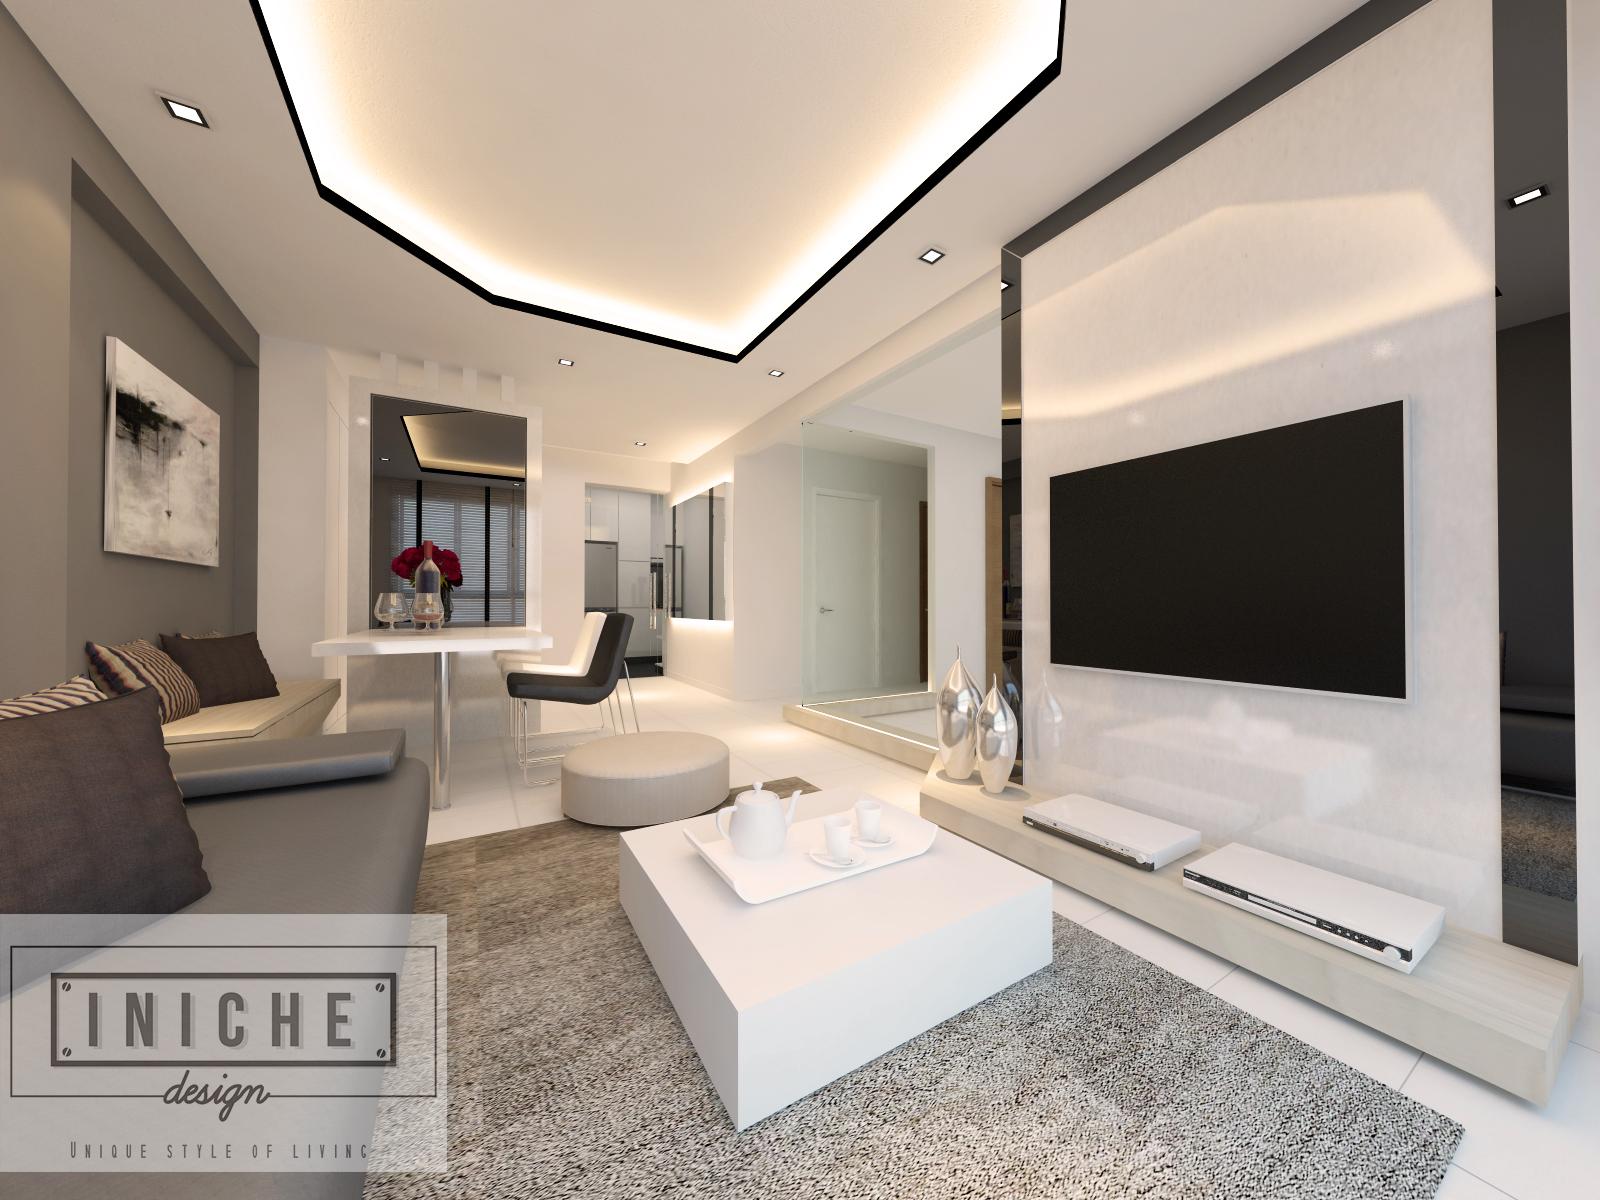 Iniche designs interior 5 room hdb home services singapore for Room 5 design